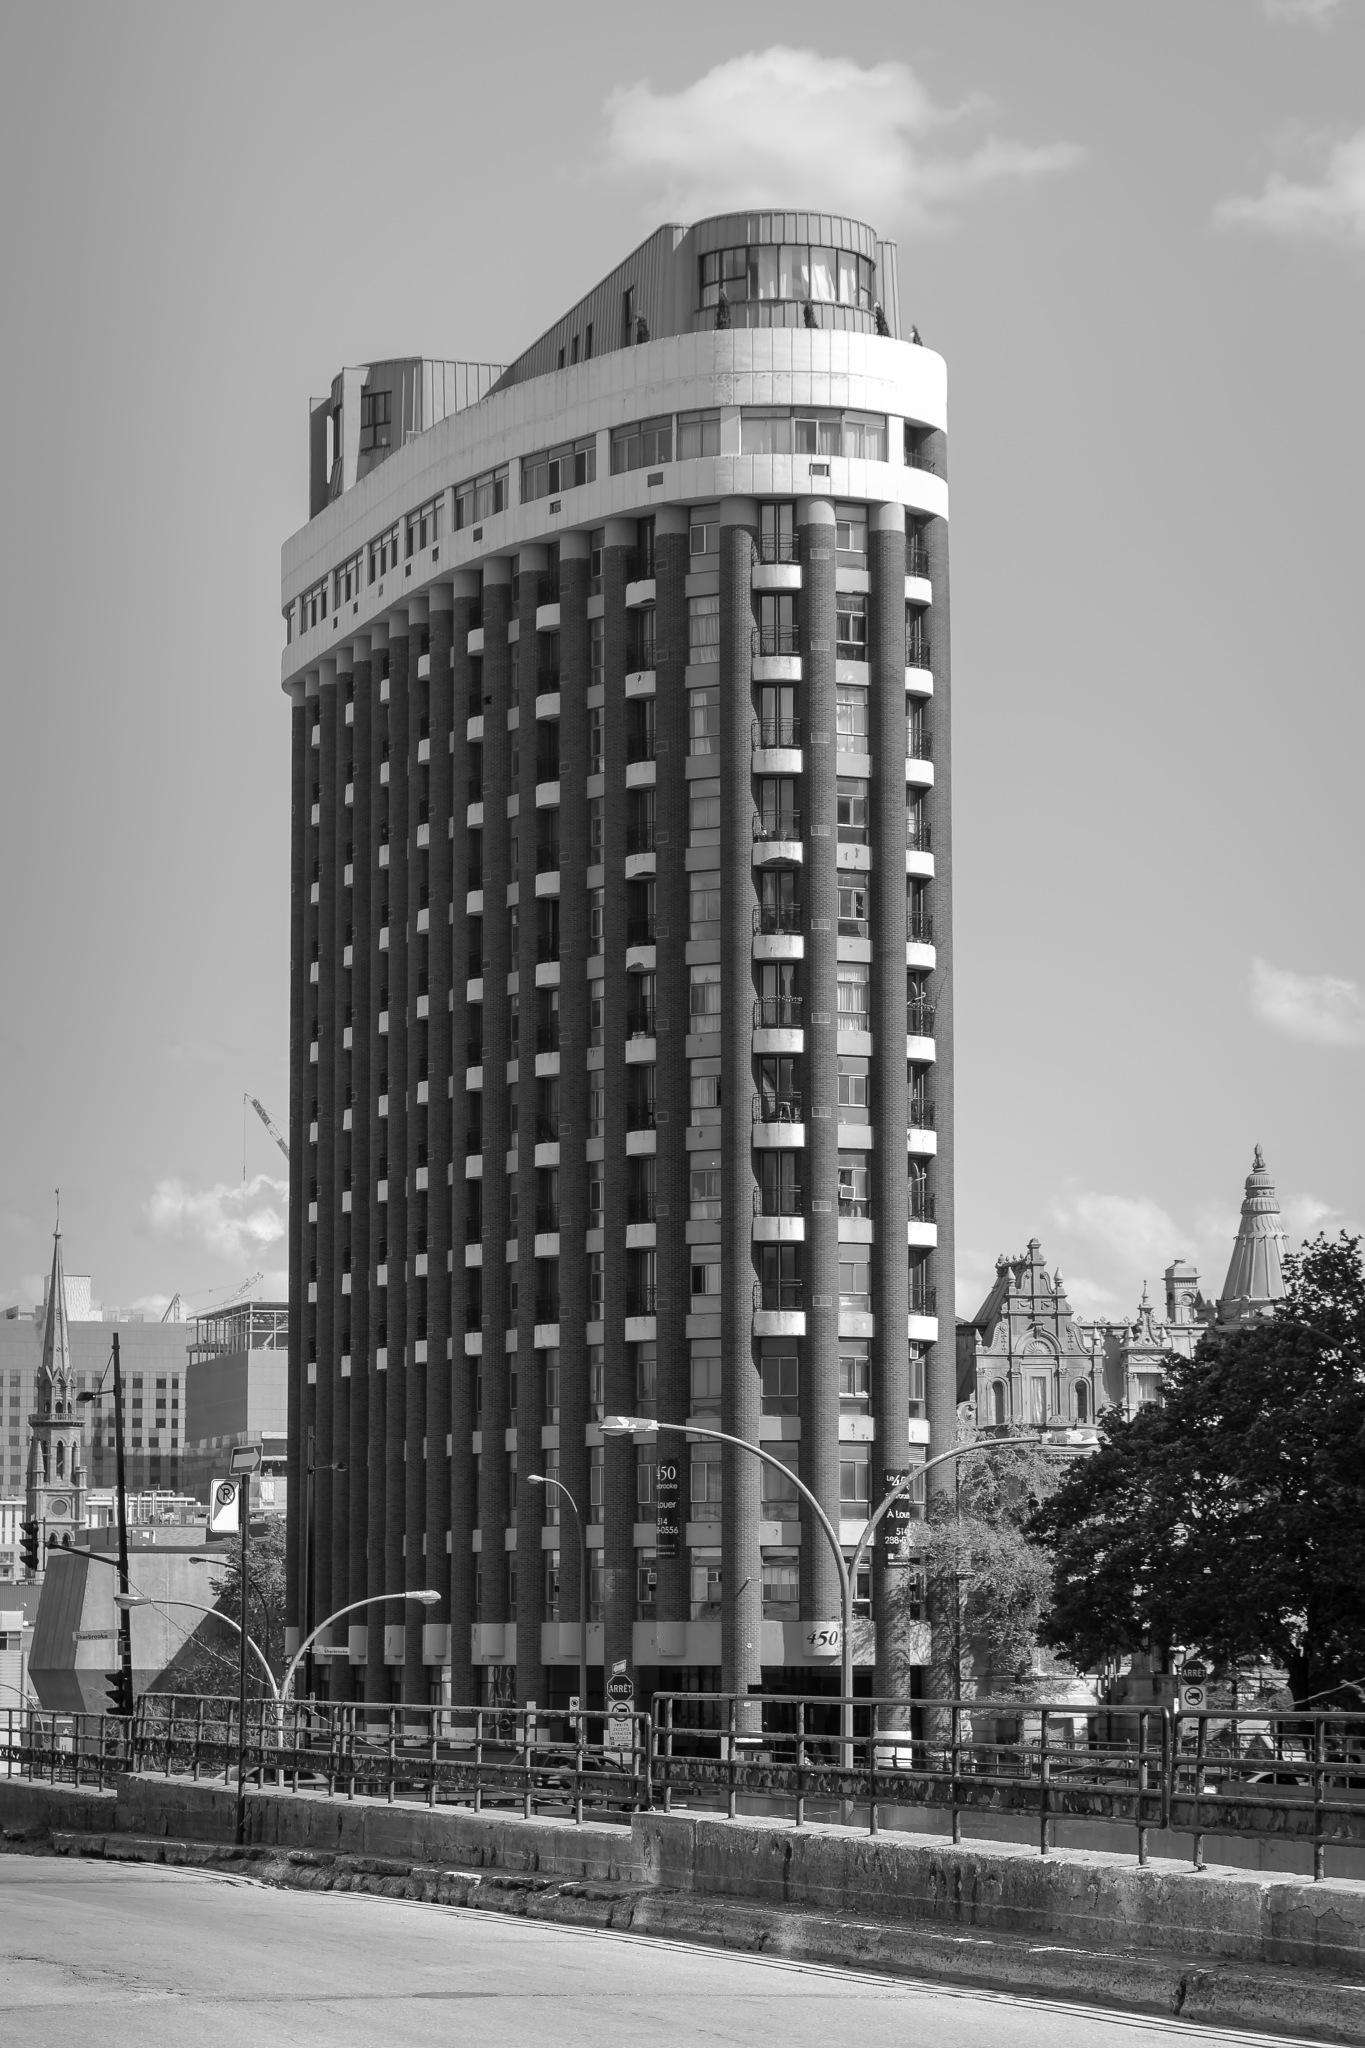 The oval building by Hervé Samson